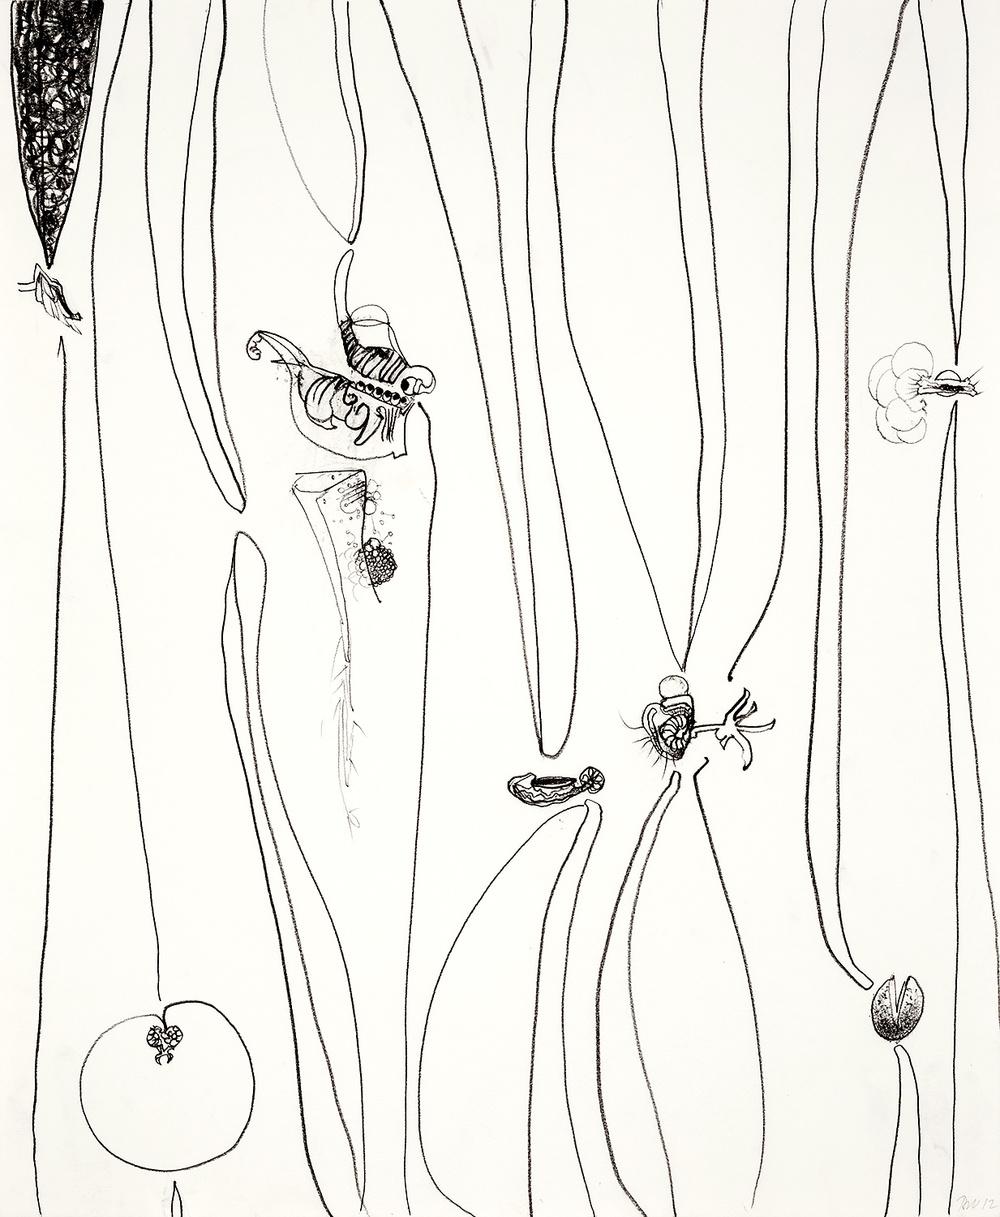 "Brian Wood <br> ""Lacuna""  <br> Graphite on paper  <br>  17 x 14 in."